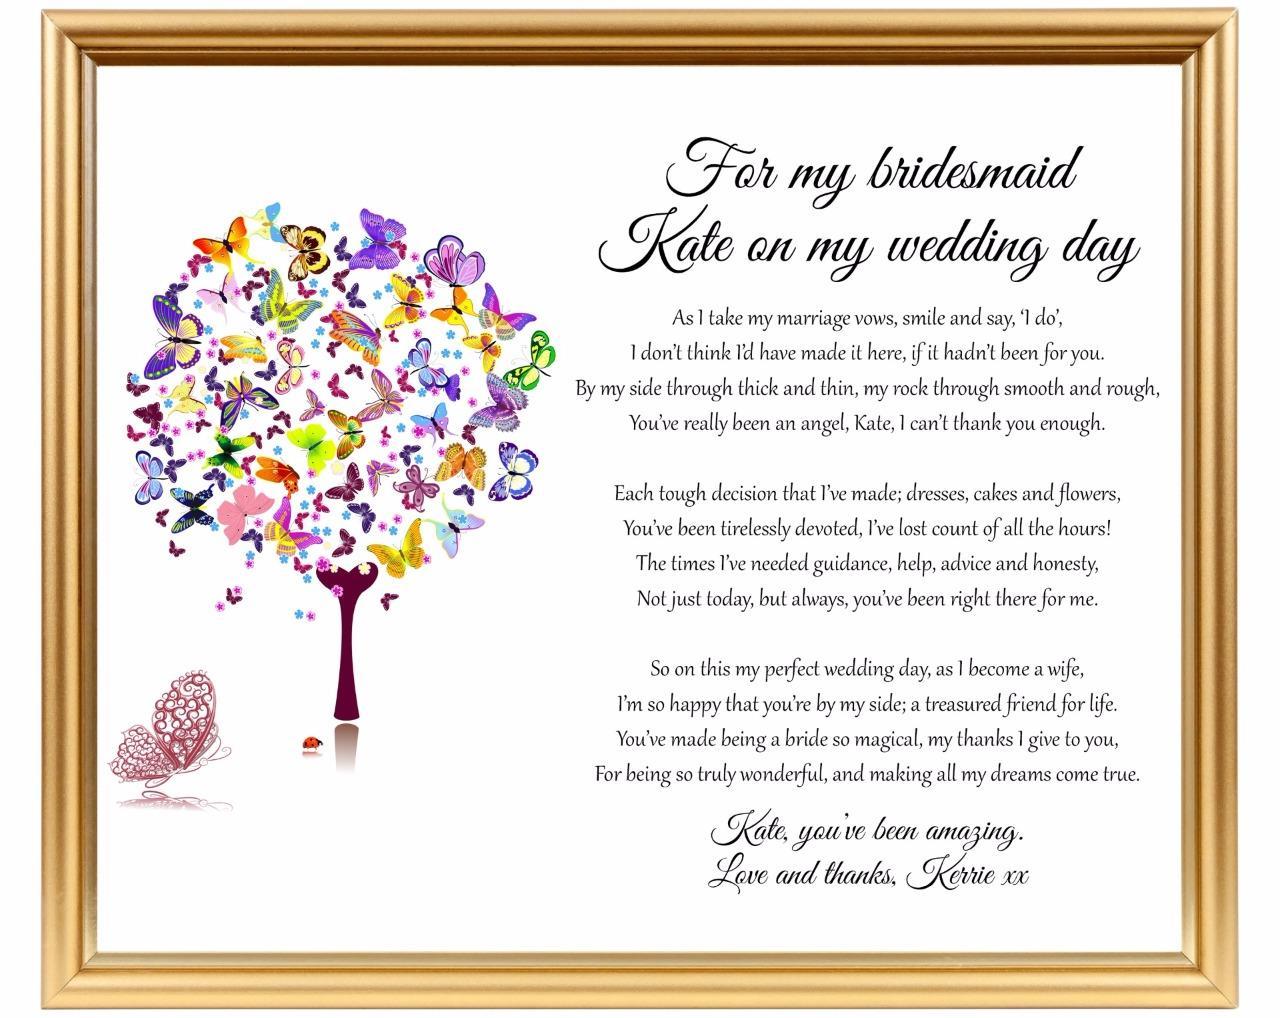 Bridesmaid Thank You Poem